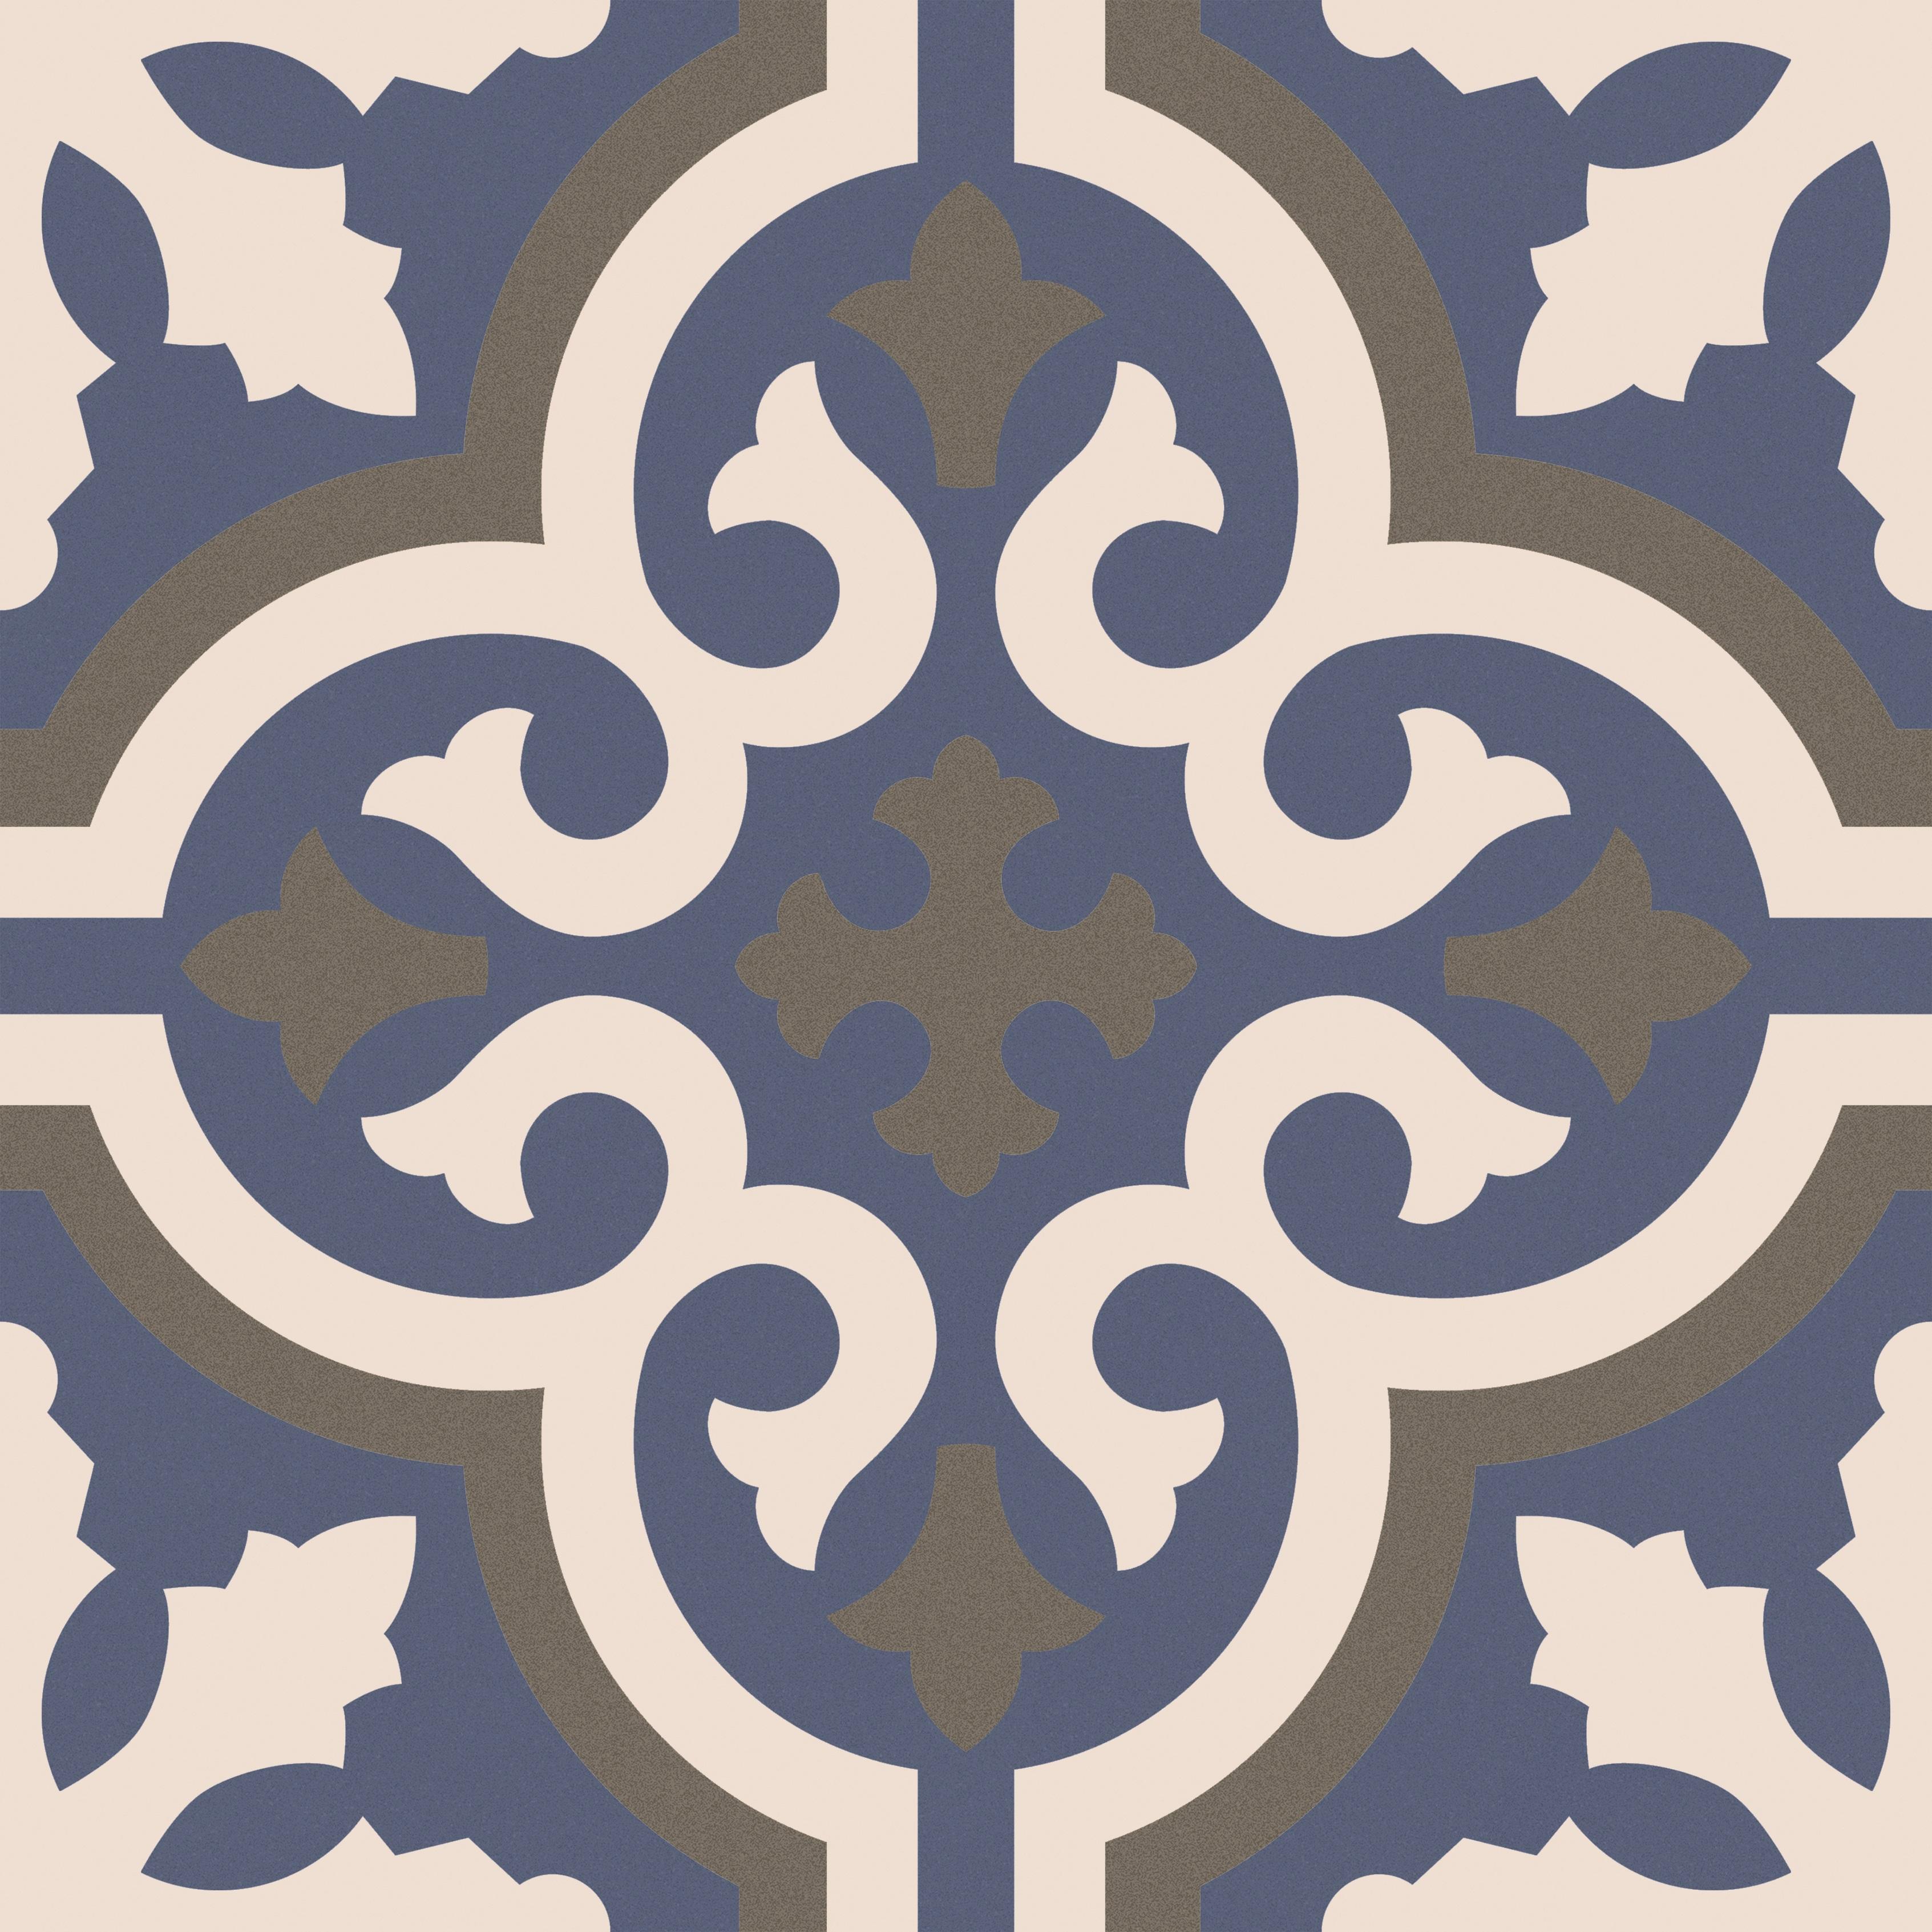 Marseille - Timon Silver Lion Trading, Marseille patterned porcelain